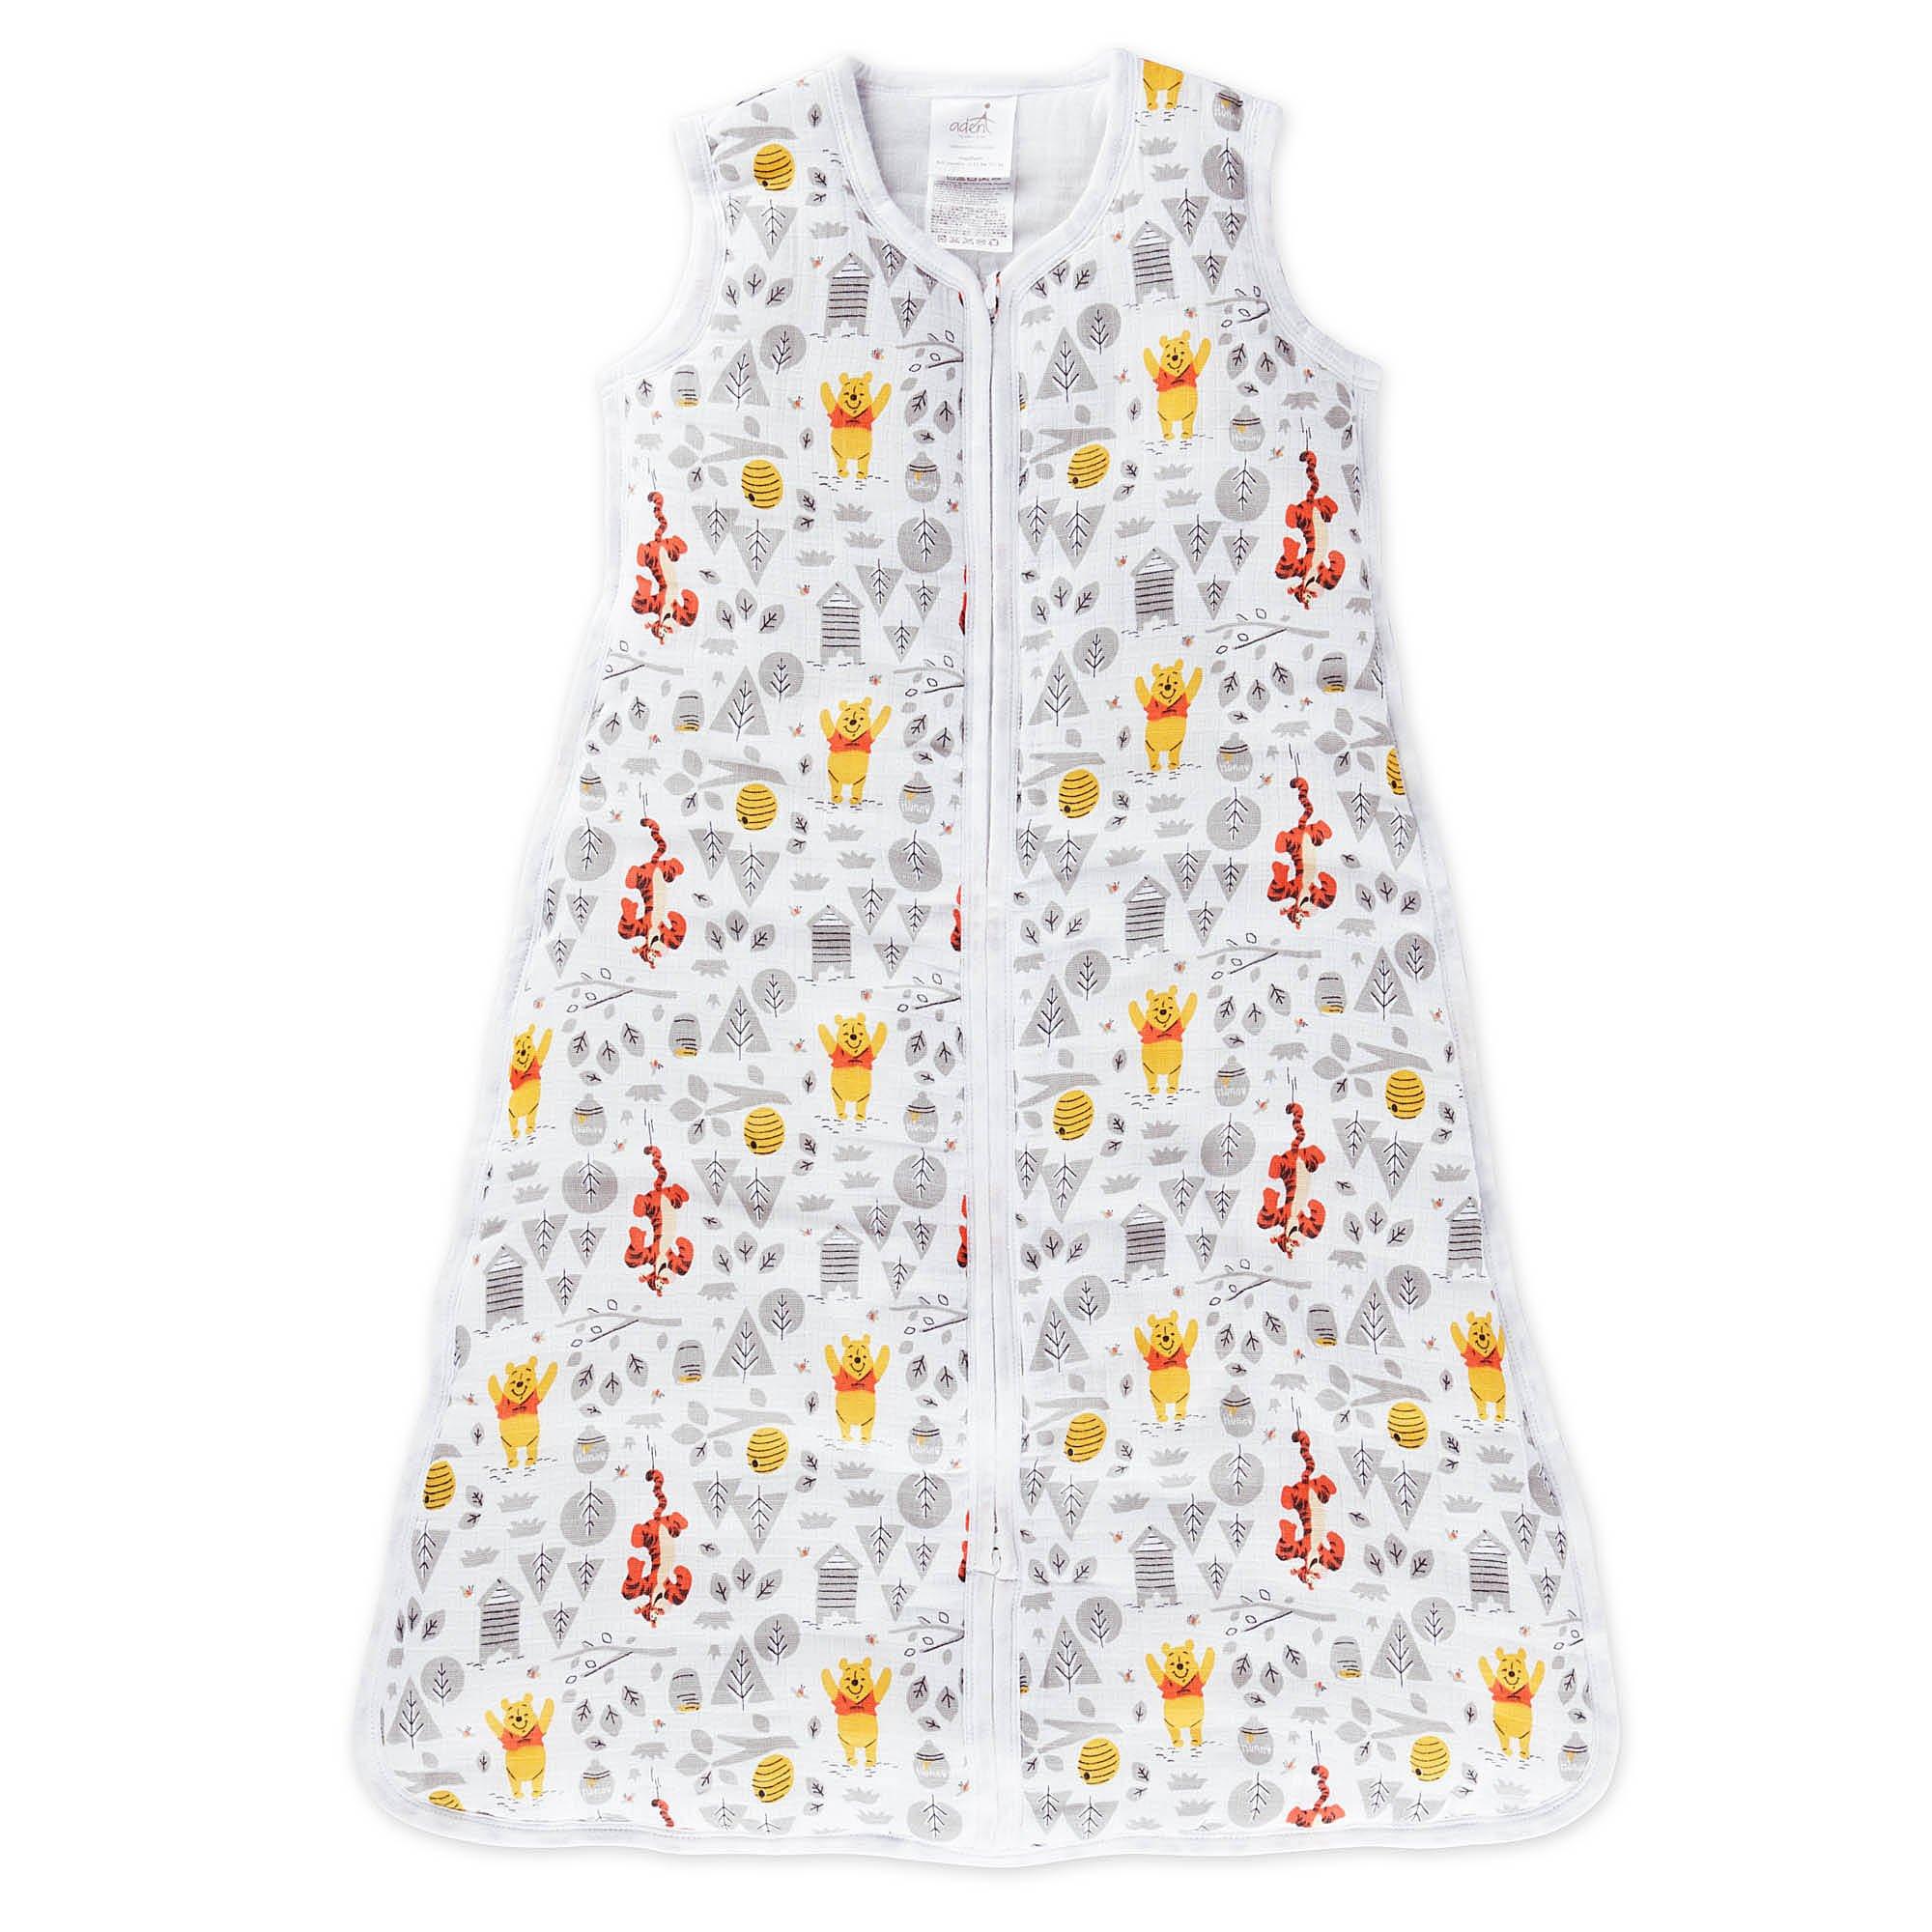 aden por aden + anais 2,5tog) saco de dormir de invierno–Winnie the Pooh de Winnie the Pooh (0–6meses)